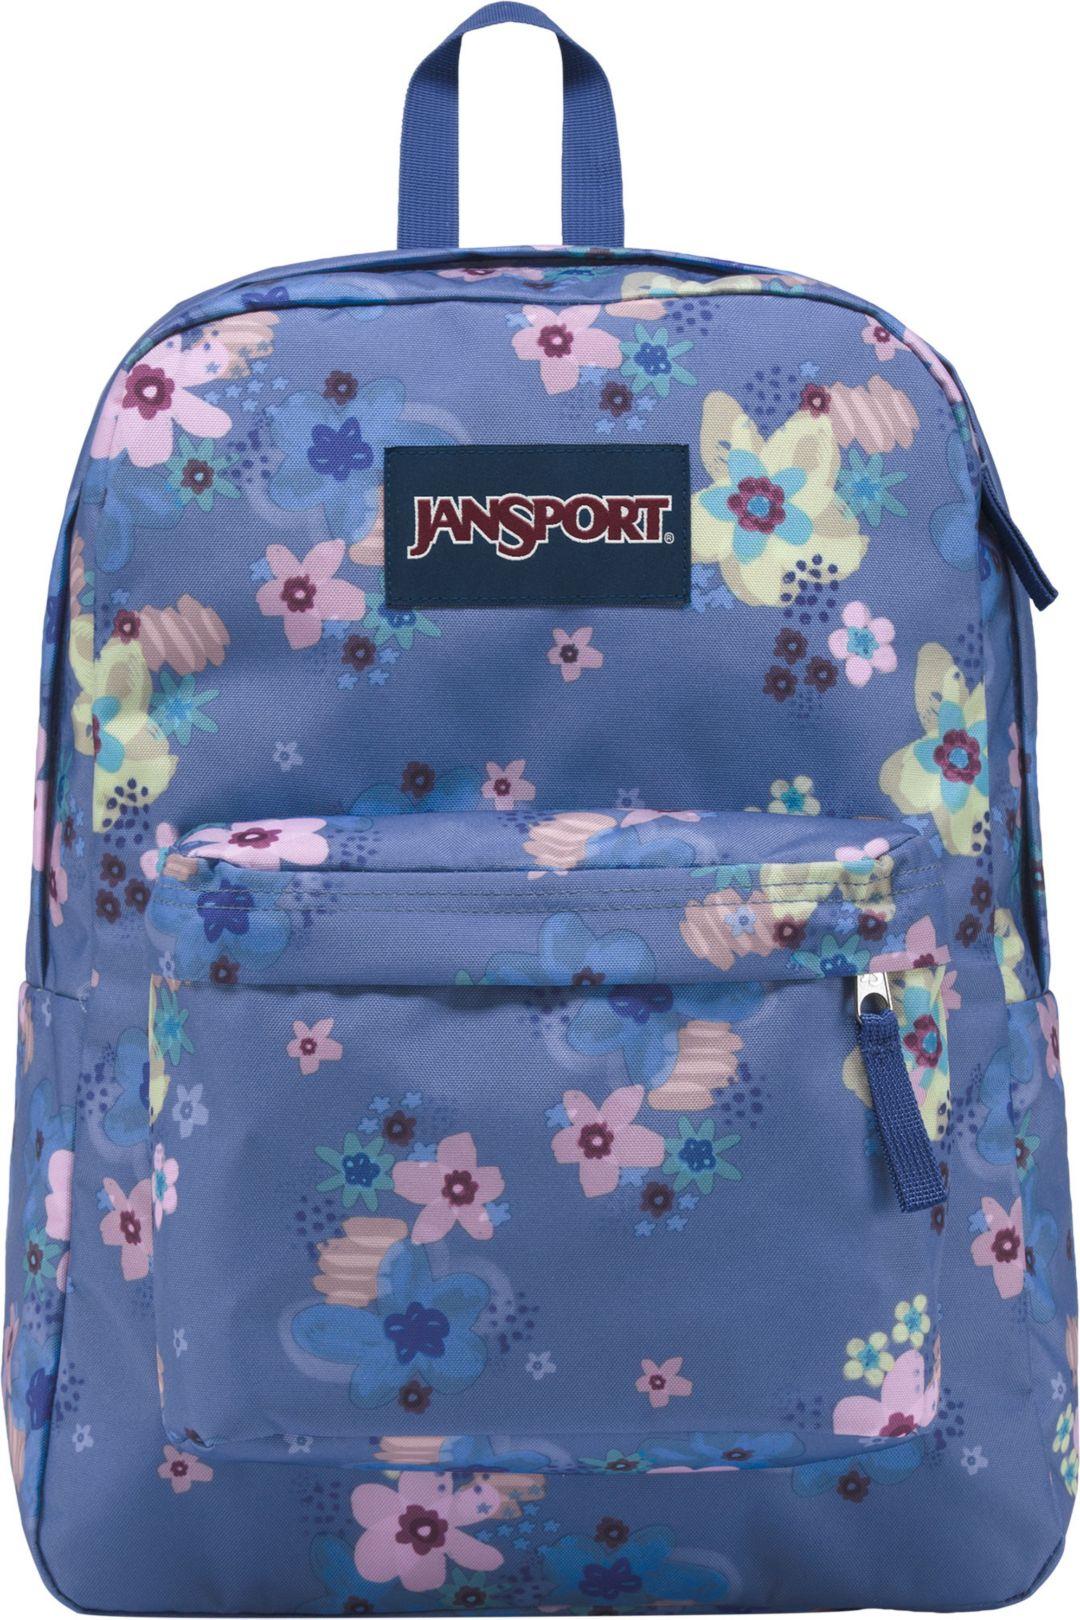 Jansport Superbreak Backpack Purple Night - Swiss Paralympic